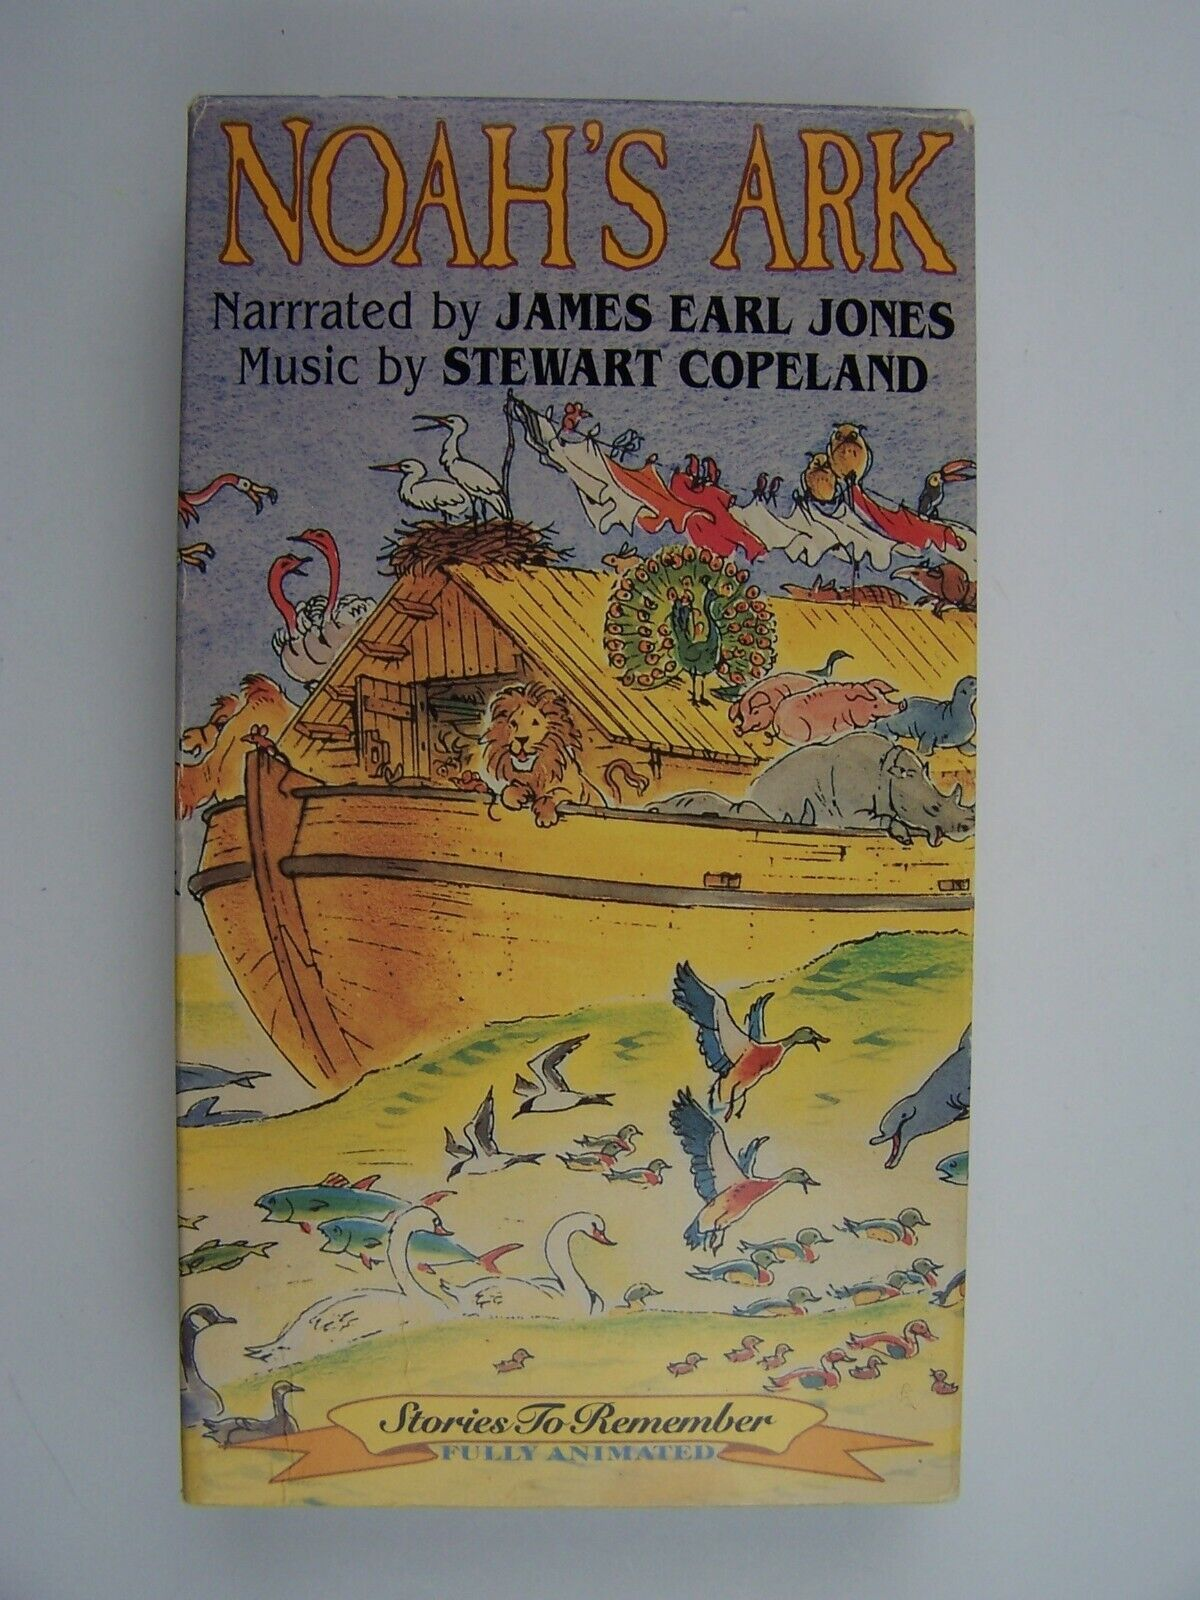 Noah's Ark VHS Narrated by James Earl Jones 85365400139